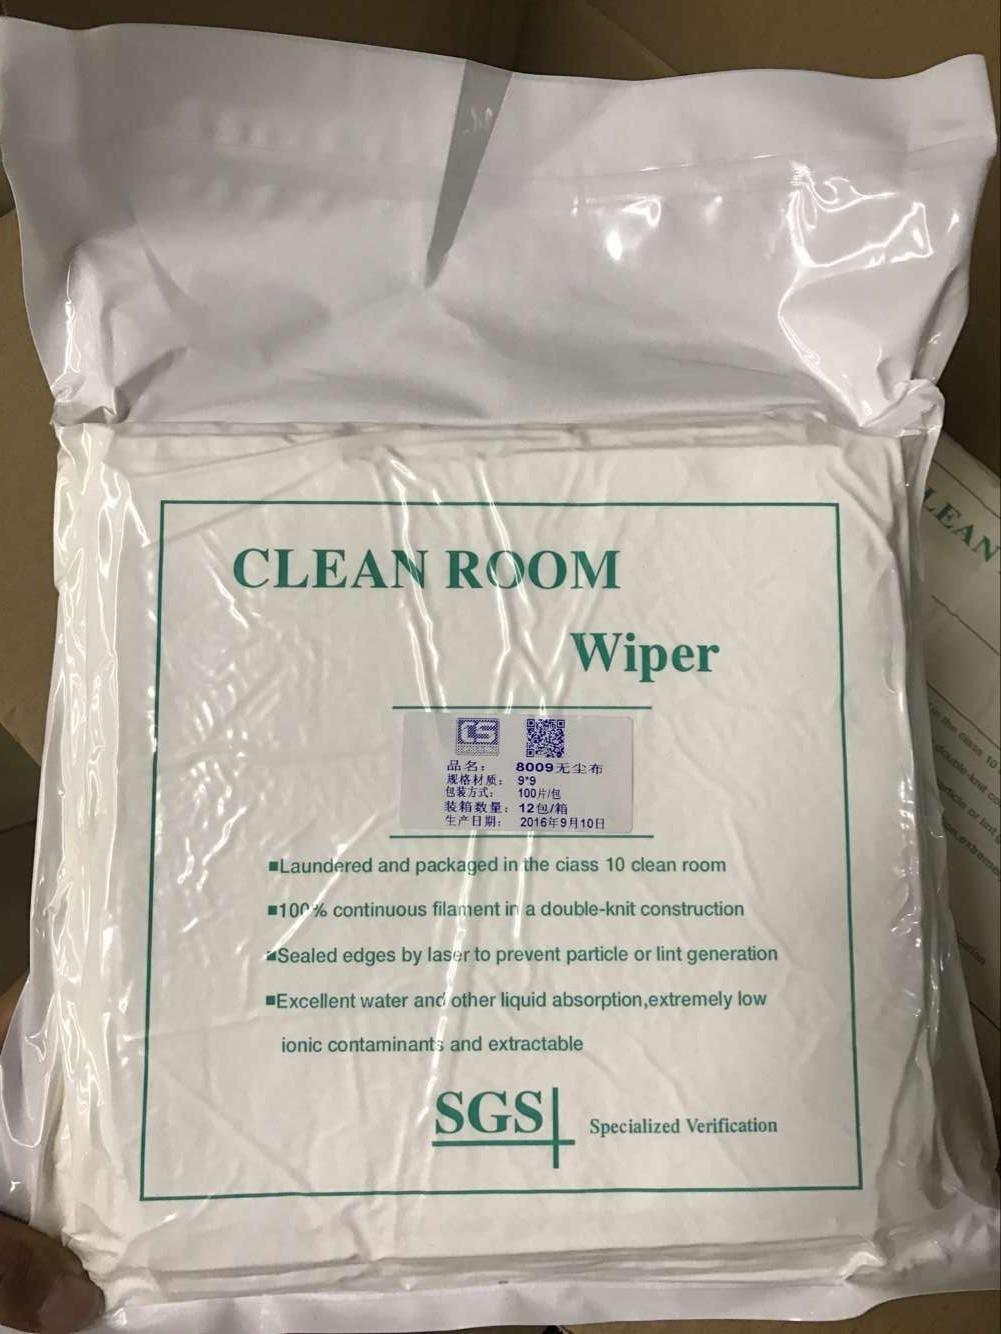 Vải lau phòng sạch 8009 1009 2009 3008